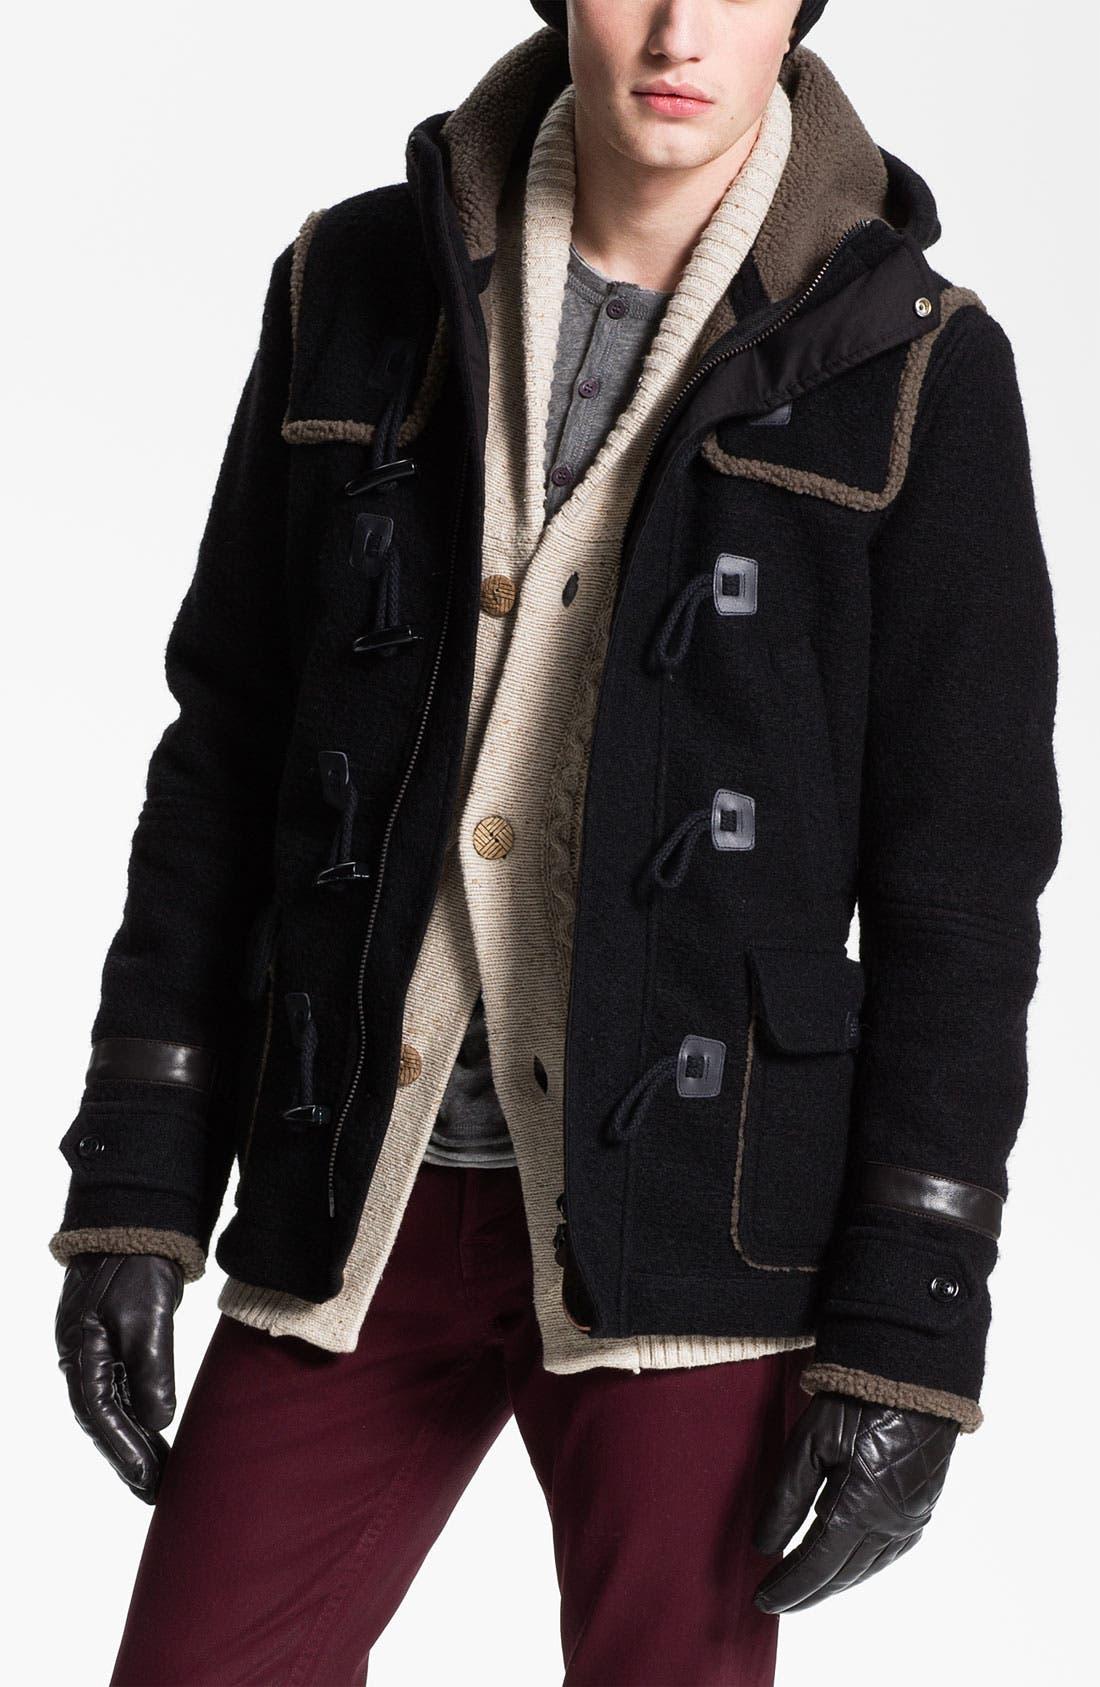 Alternate Image 1 Selected - DIESEL® 'Whitaker' Duffle Coat